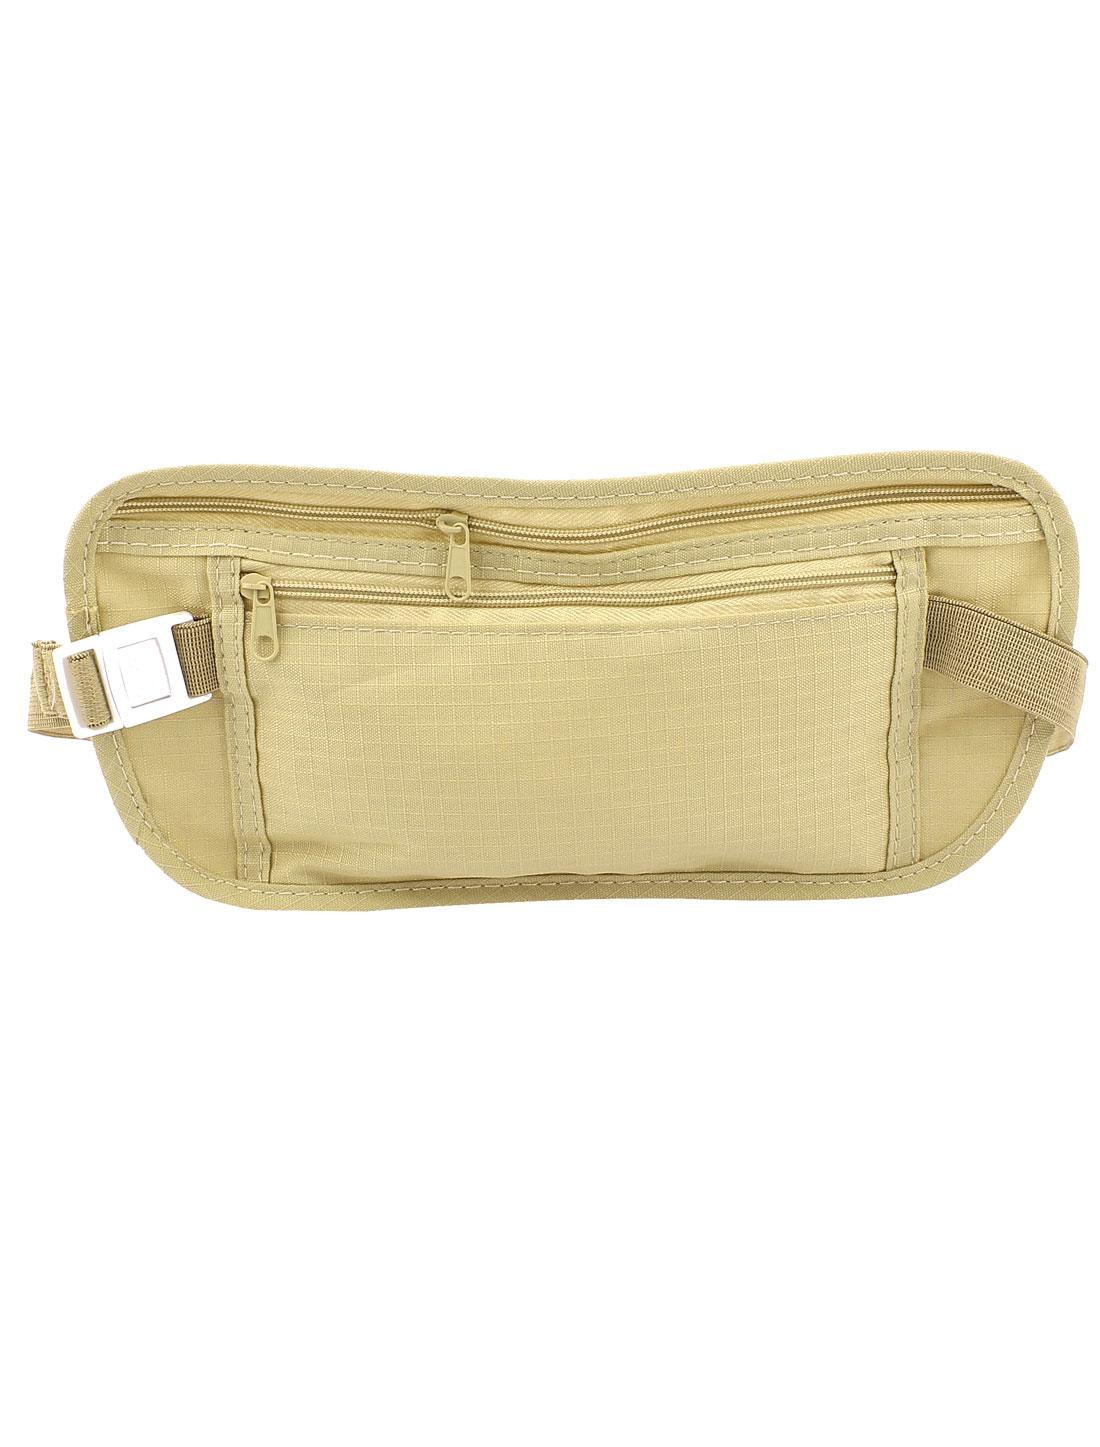 Men Adjustable Elastic Strap 2 Compartments Zipper Closure Khaki Nylon Waist Bag Pack Pouch